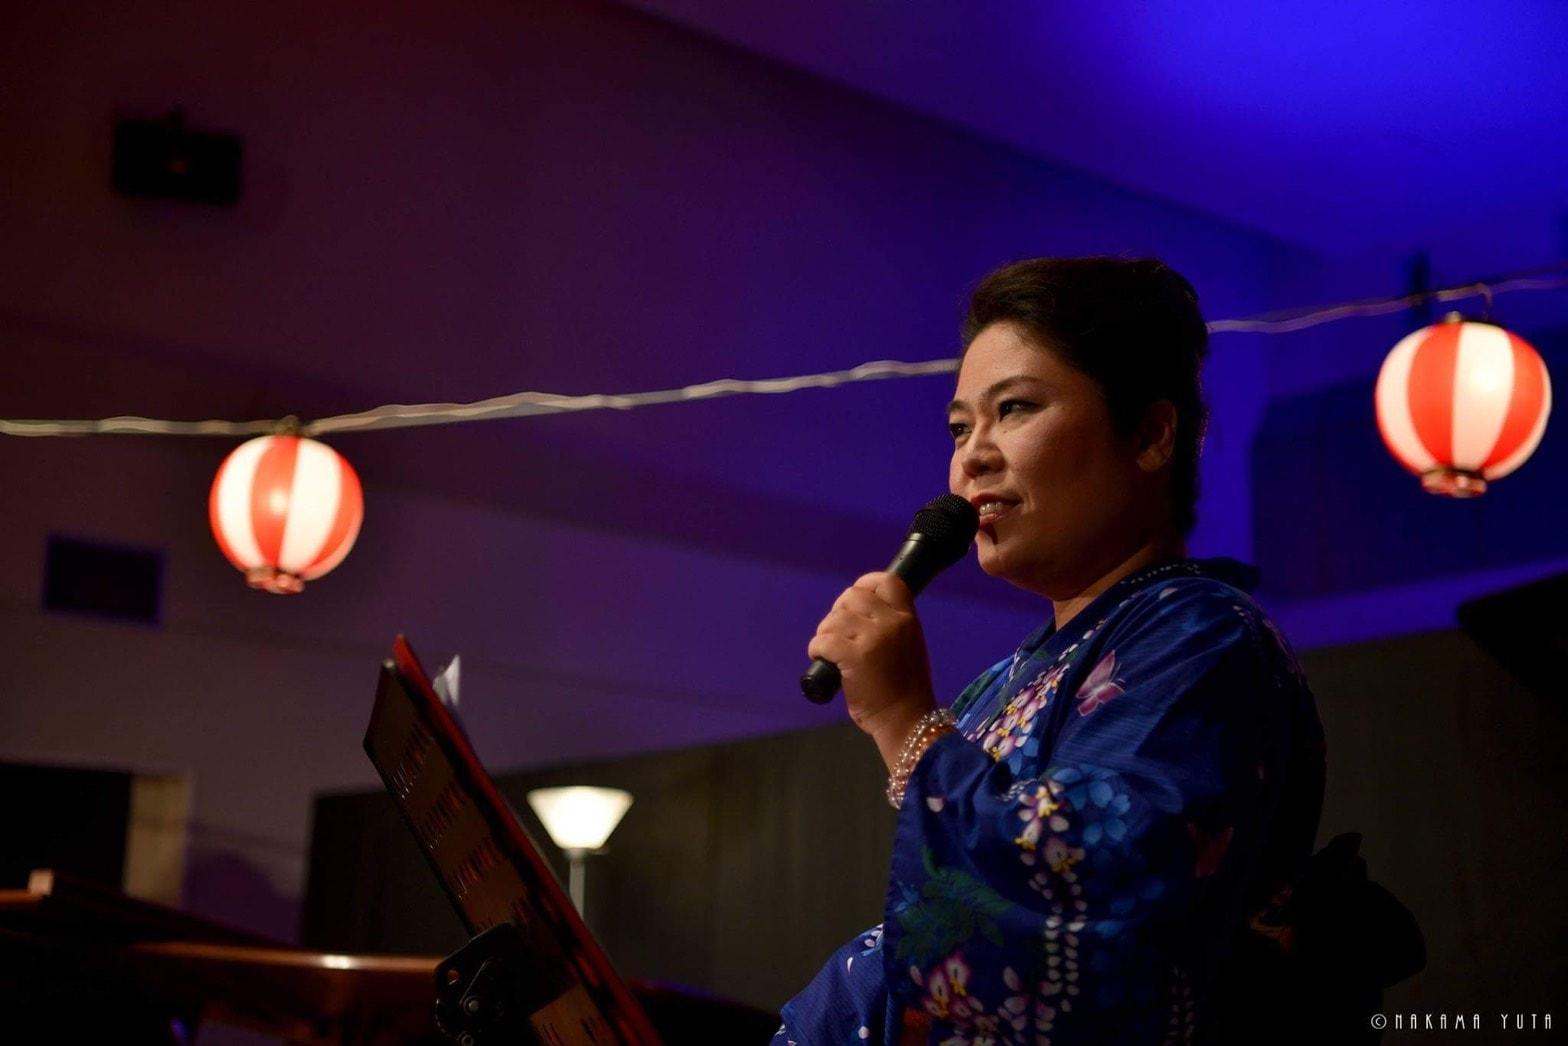 mimoza musica (ミモザムジカ) ピアノ教室 | 歌手・演奏活動|音楽を通して沖縄の地域活性活動・情報発信 |泉紀子